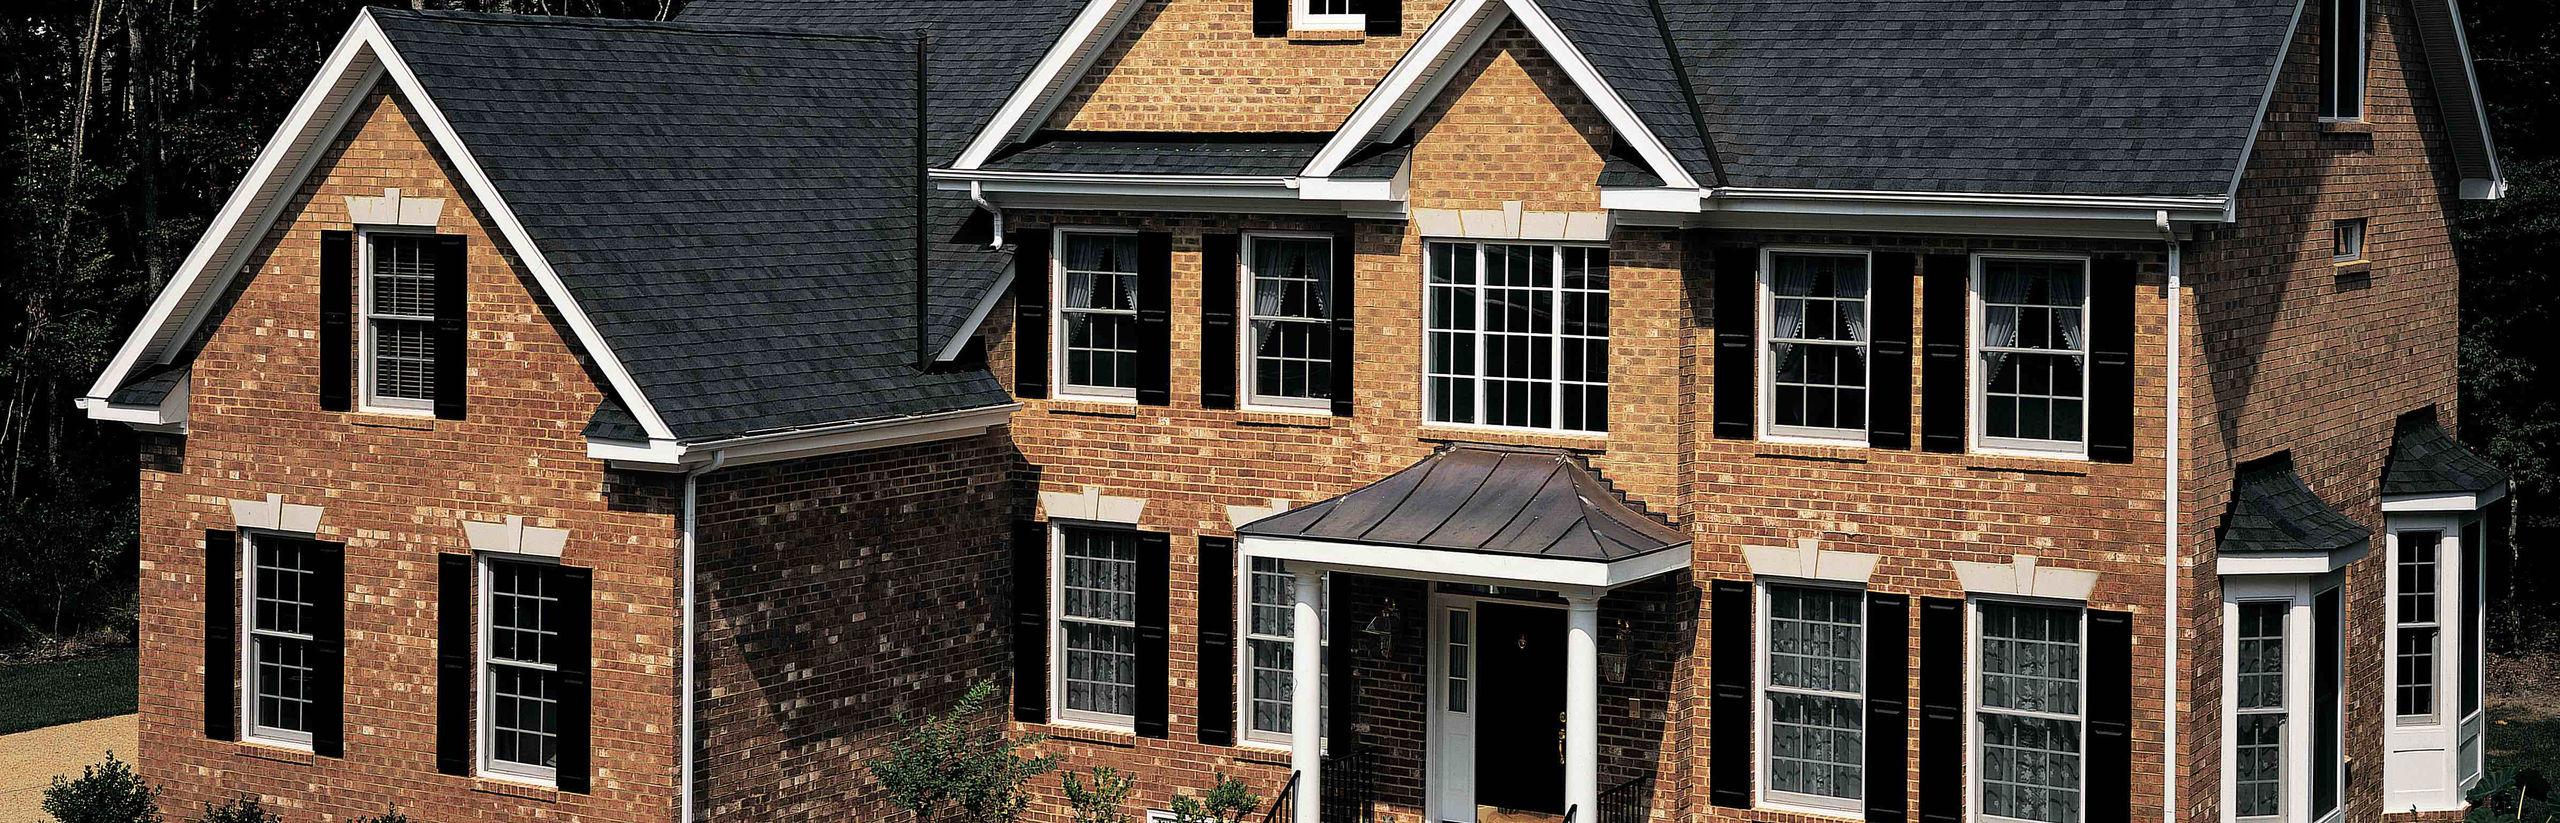 shingle-roofing-examination